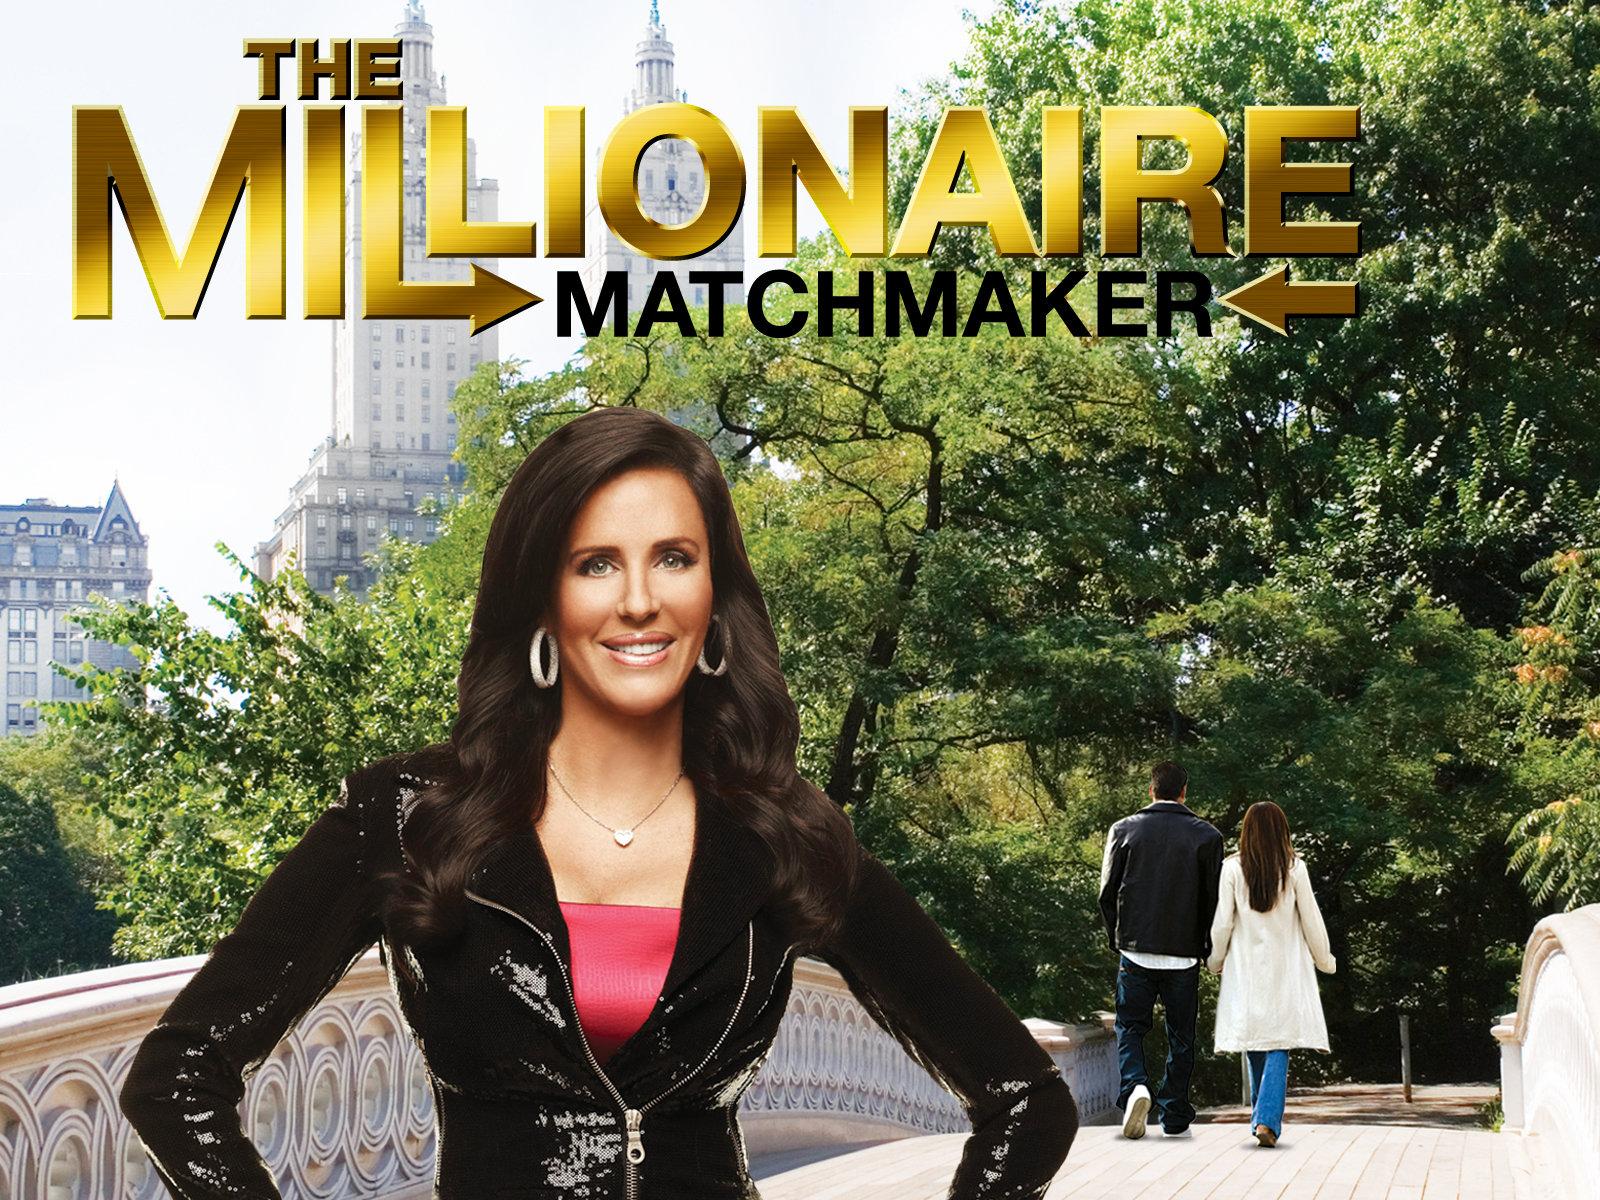 Prime Video: The Millionaire Matchmaker Season 2